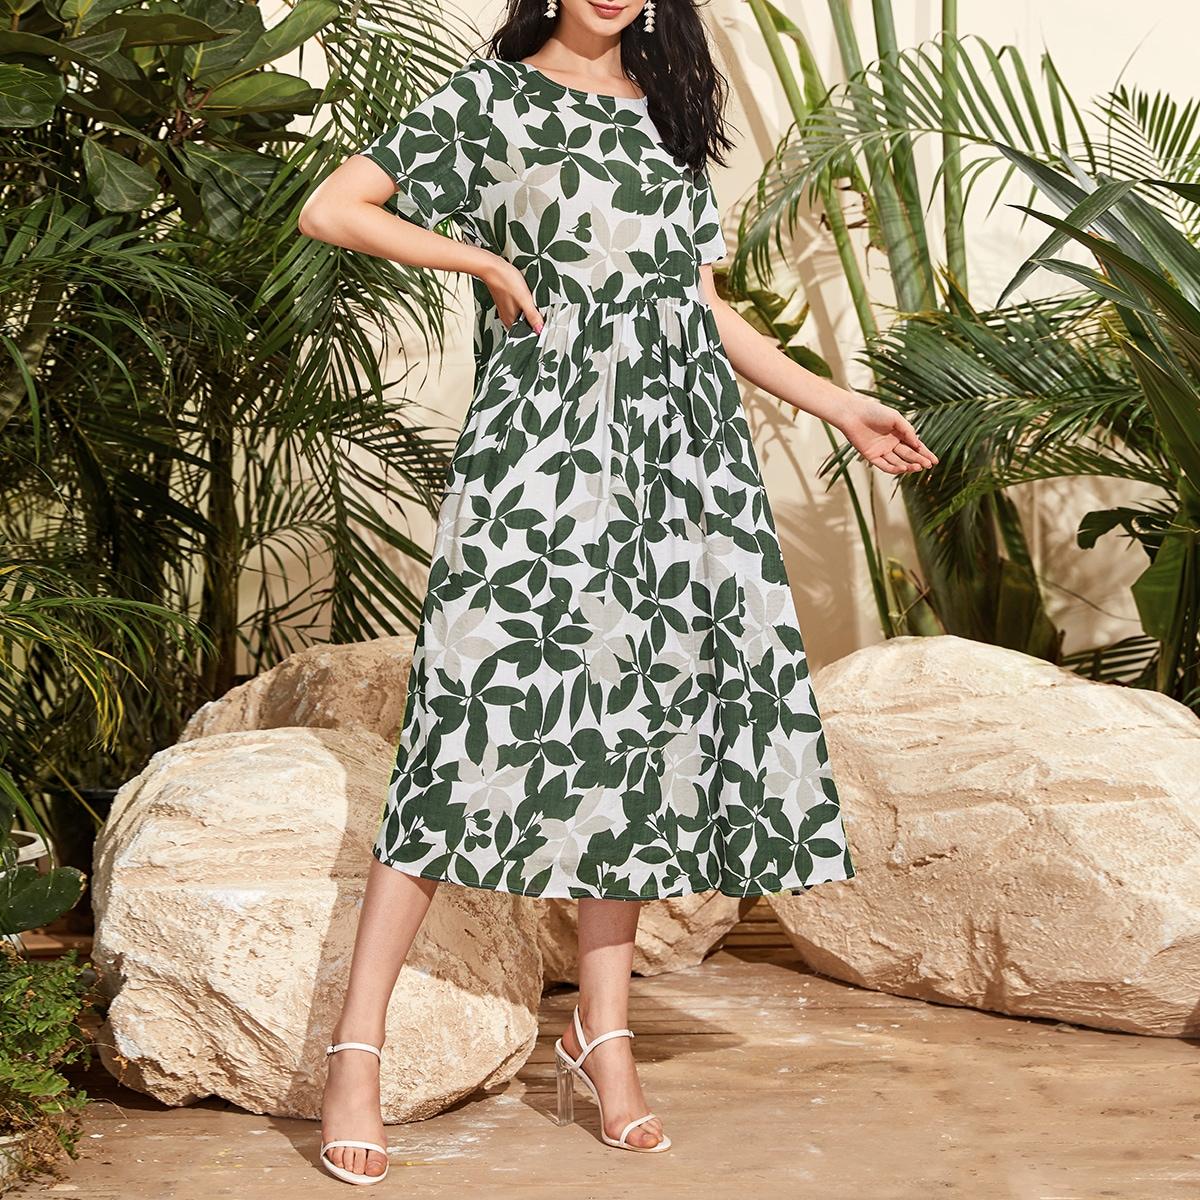 SHEIN / Floral Leaf Print Midi Dress